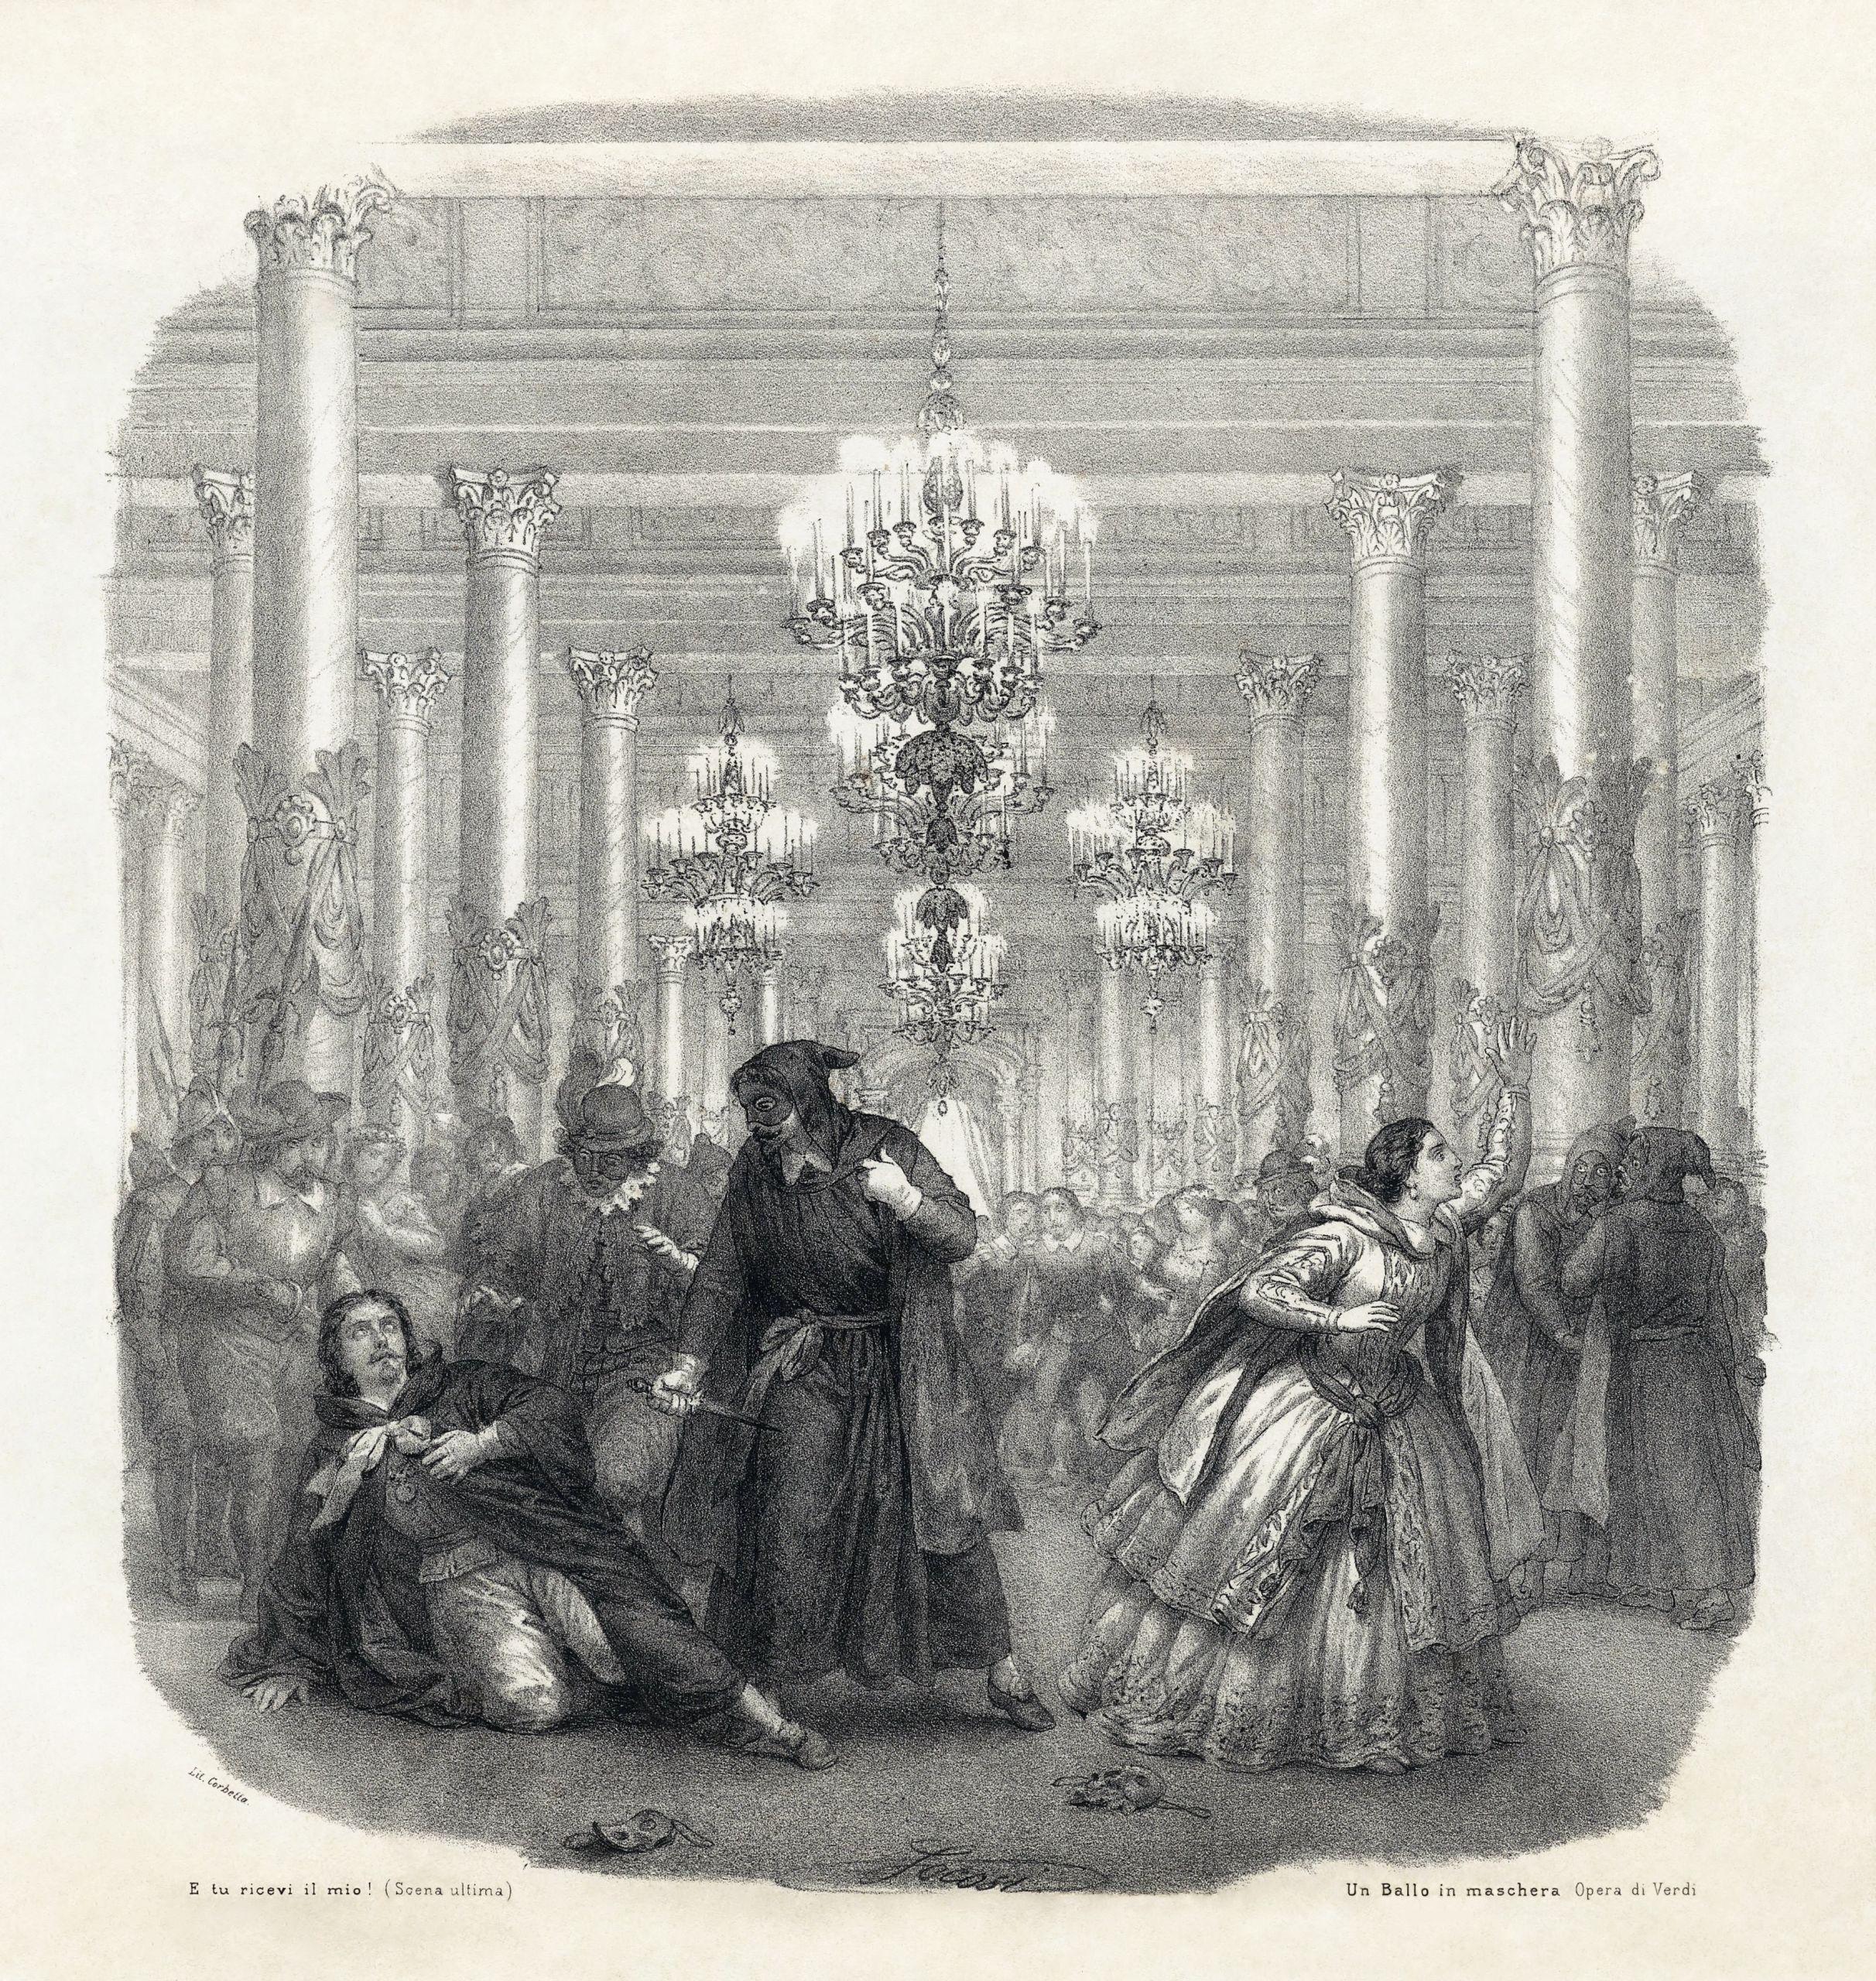 Giuseppe Verdi Un Ballo in maschera Vocal score frontispiece restoration